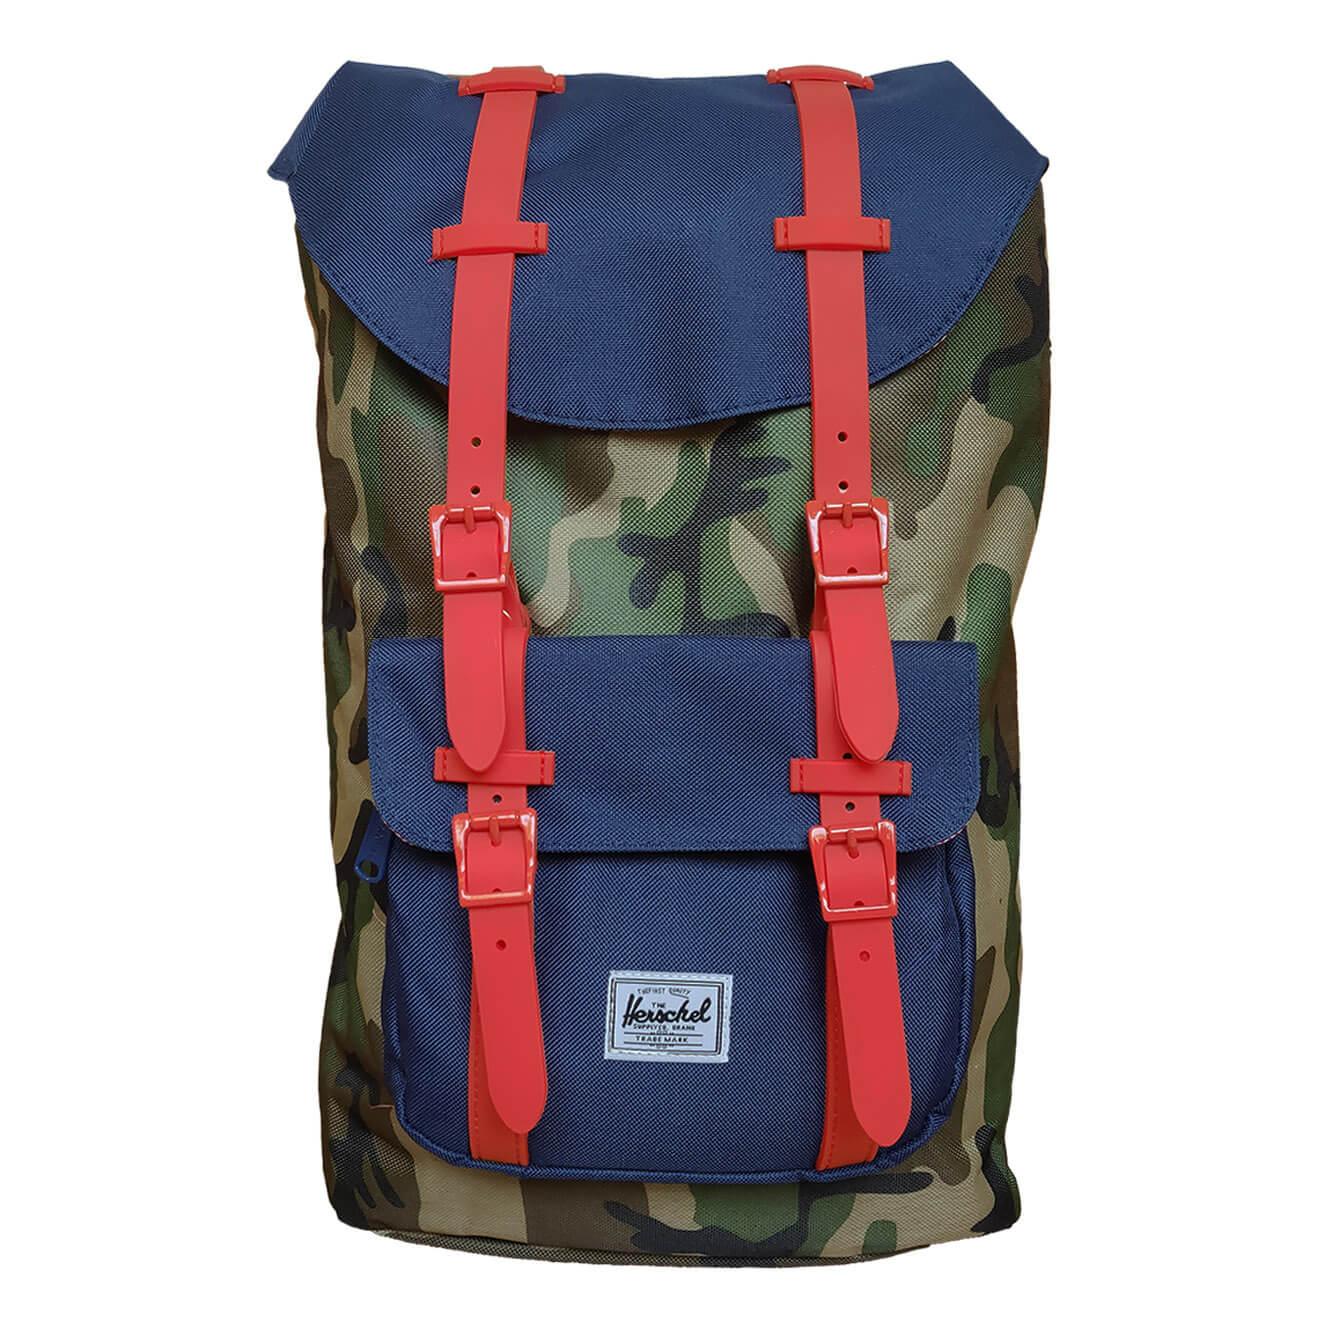 5a6eebe3bae Herschel Little America Settlement Camo Navy   Red - Retro Bags